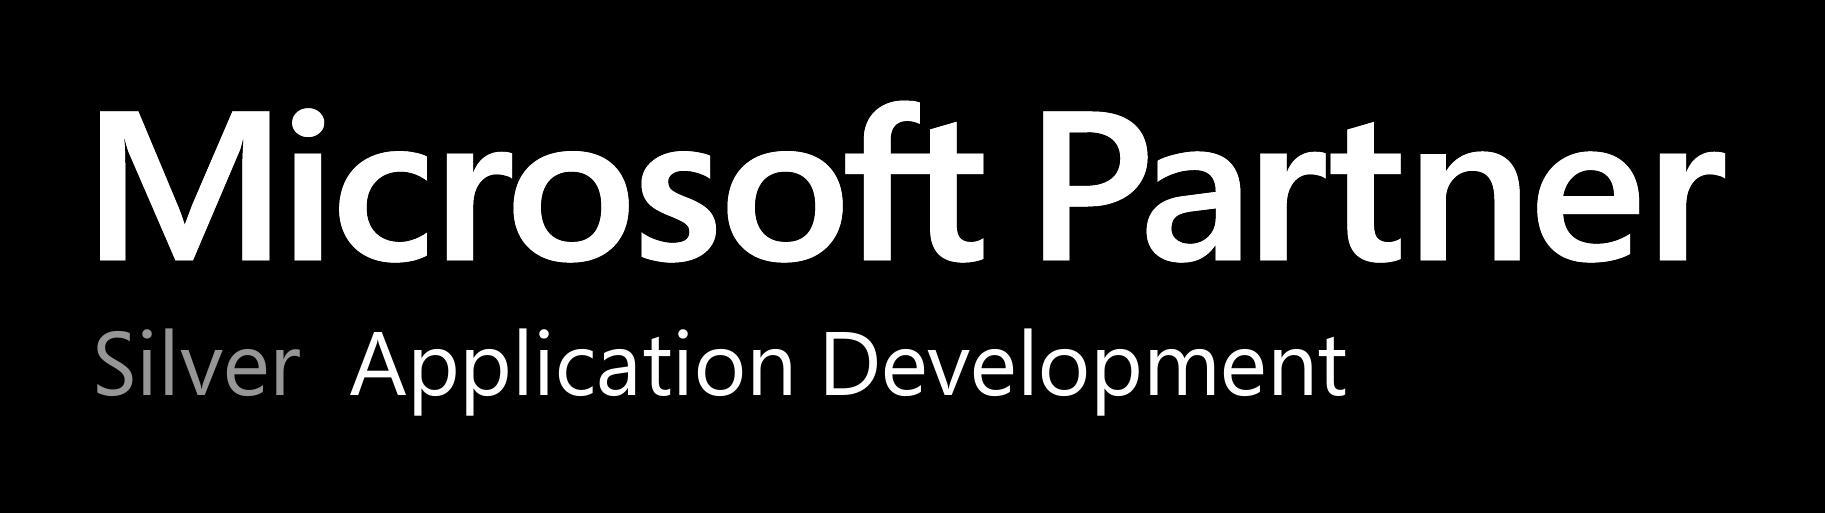 MS Silver Application Developer